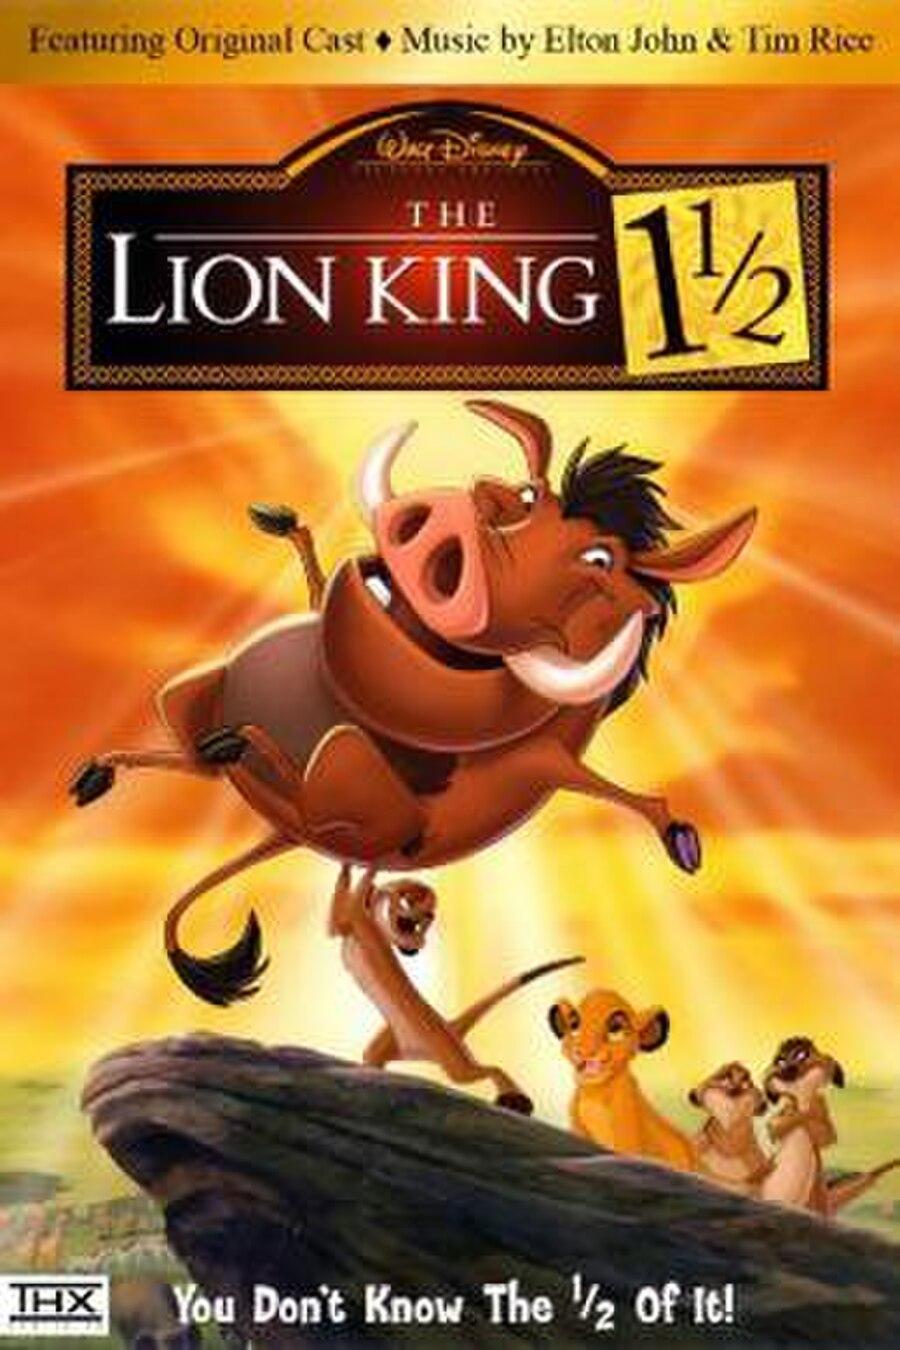 The Lion King frac